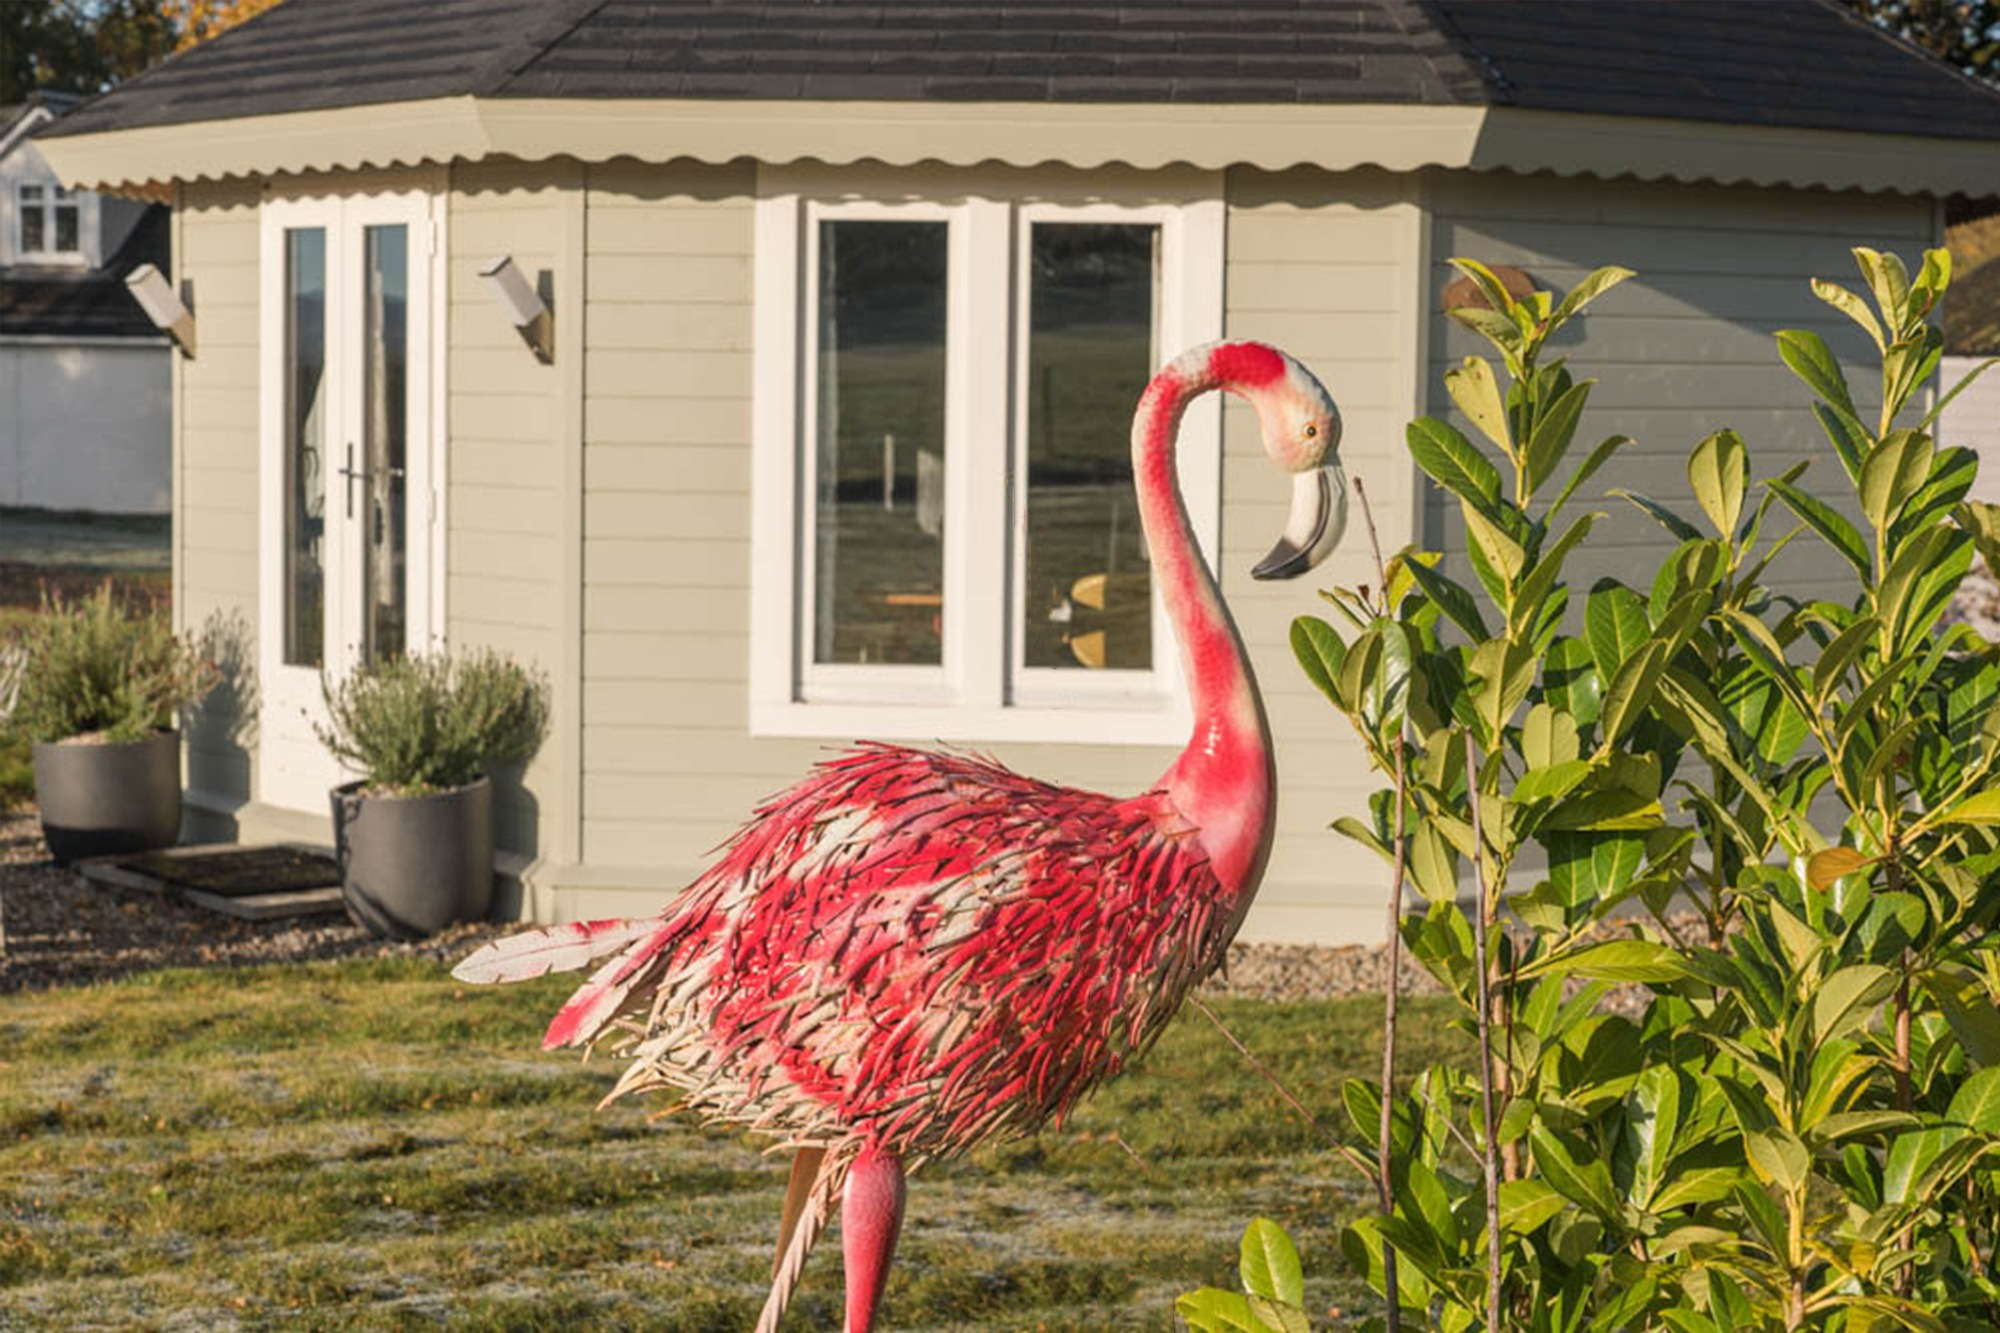 Dunroamin Self Catered Lodges - Flamingo